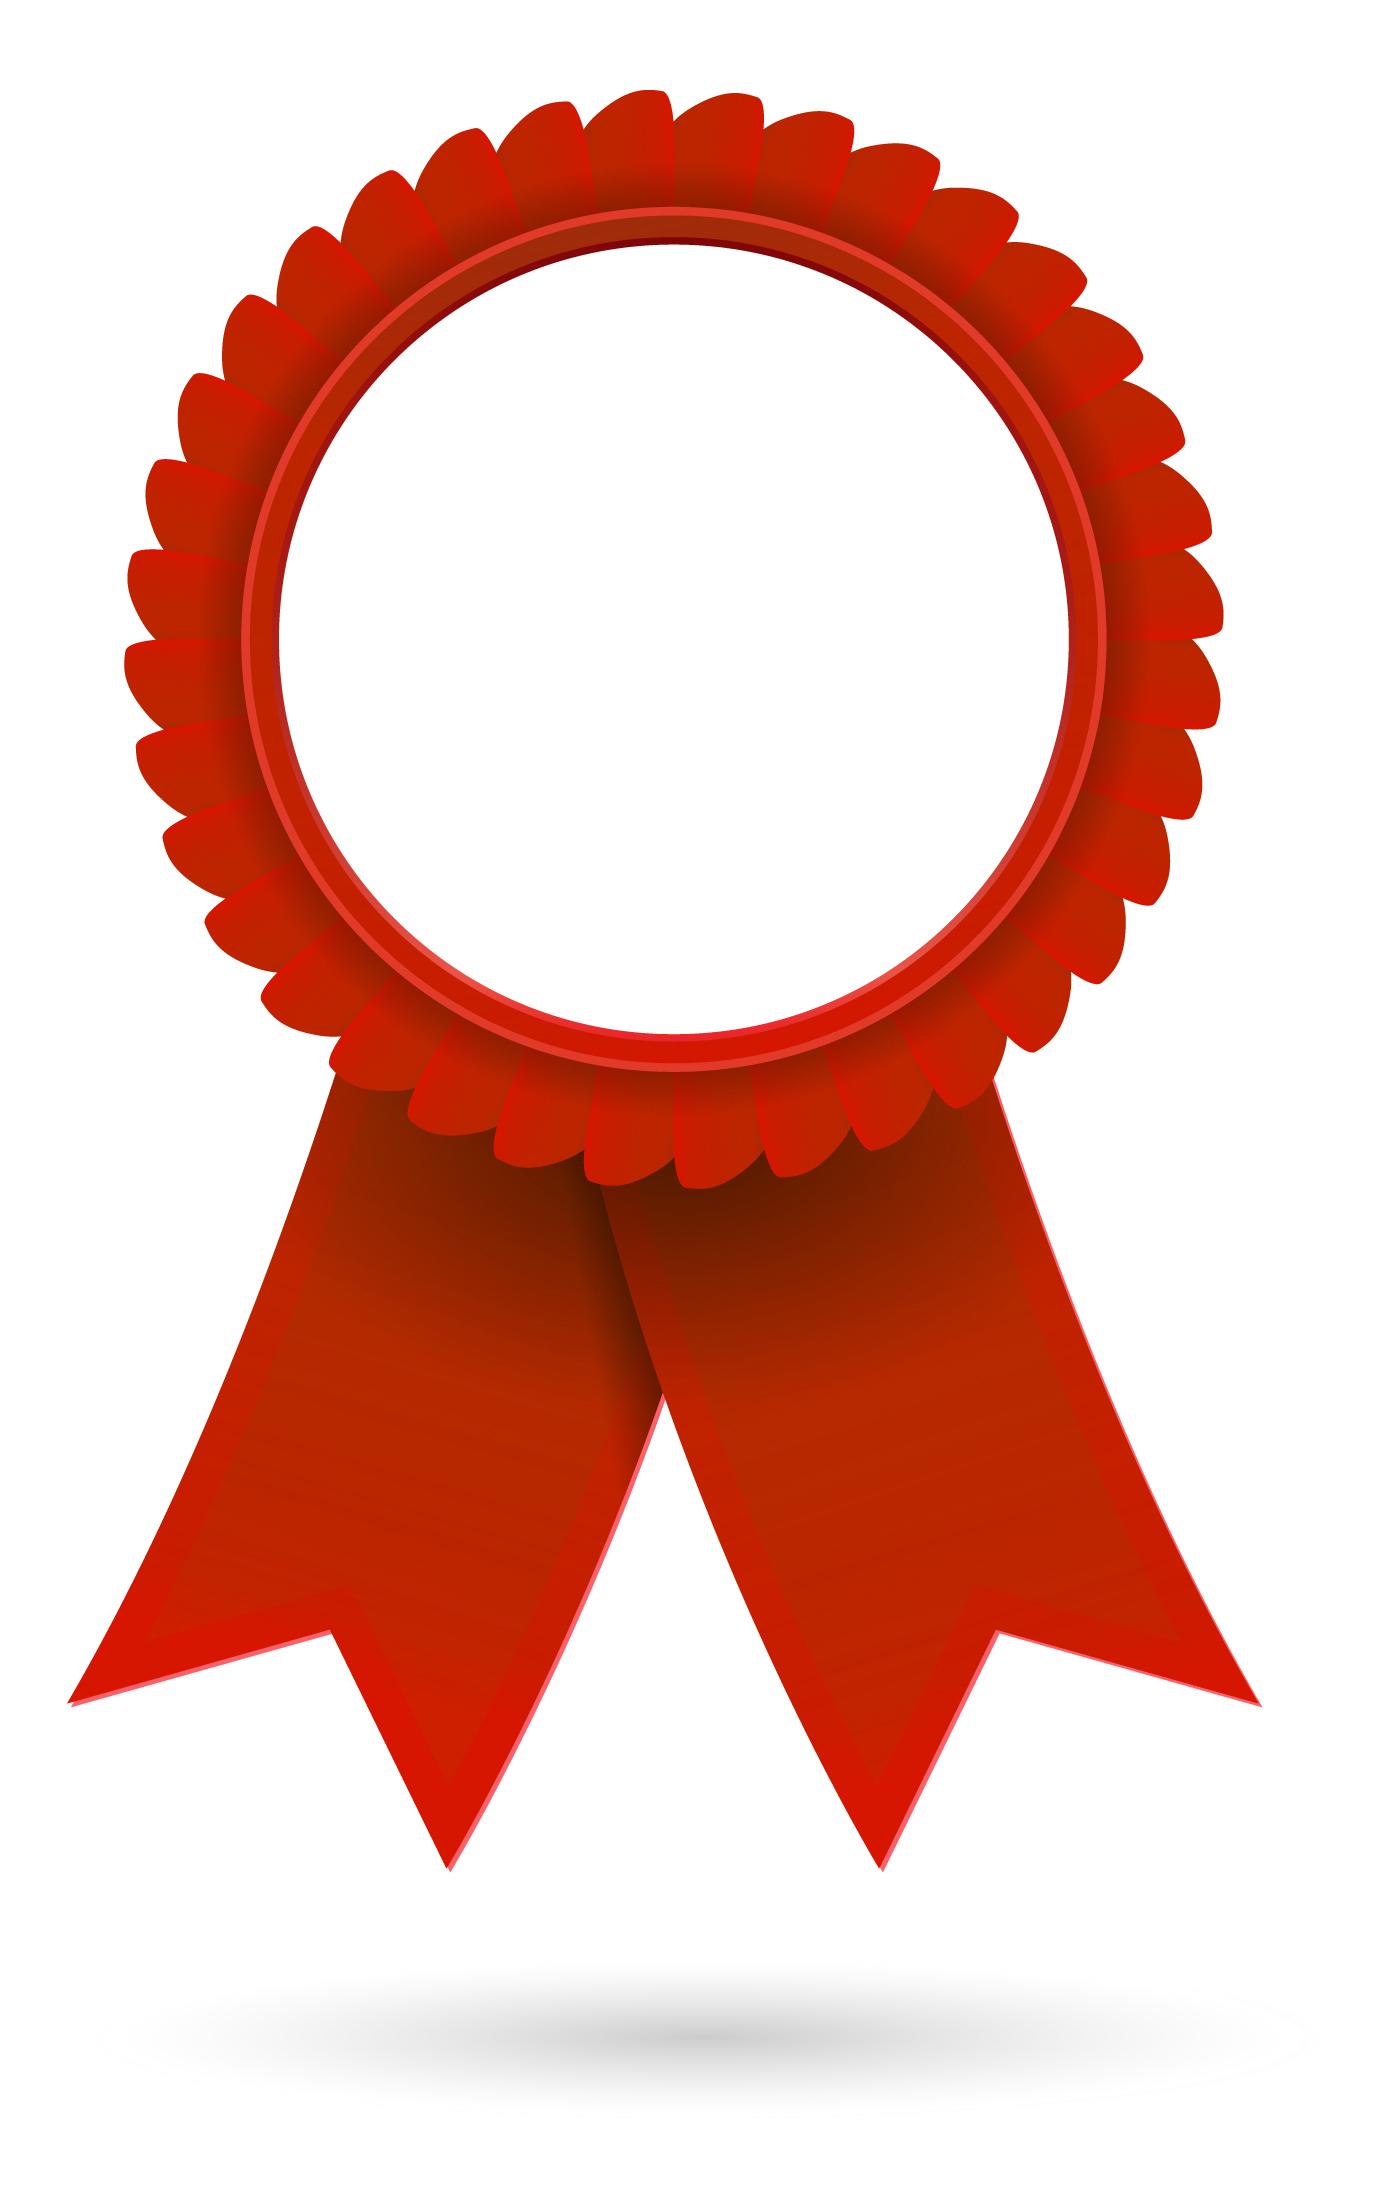 Red Award Ribbon Clipart #1-Red Award Ribbon Clipart #1-15